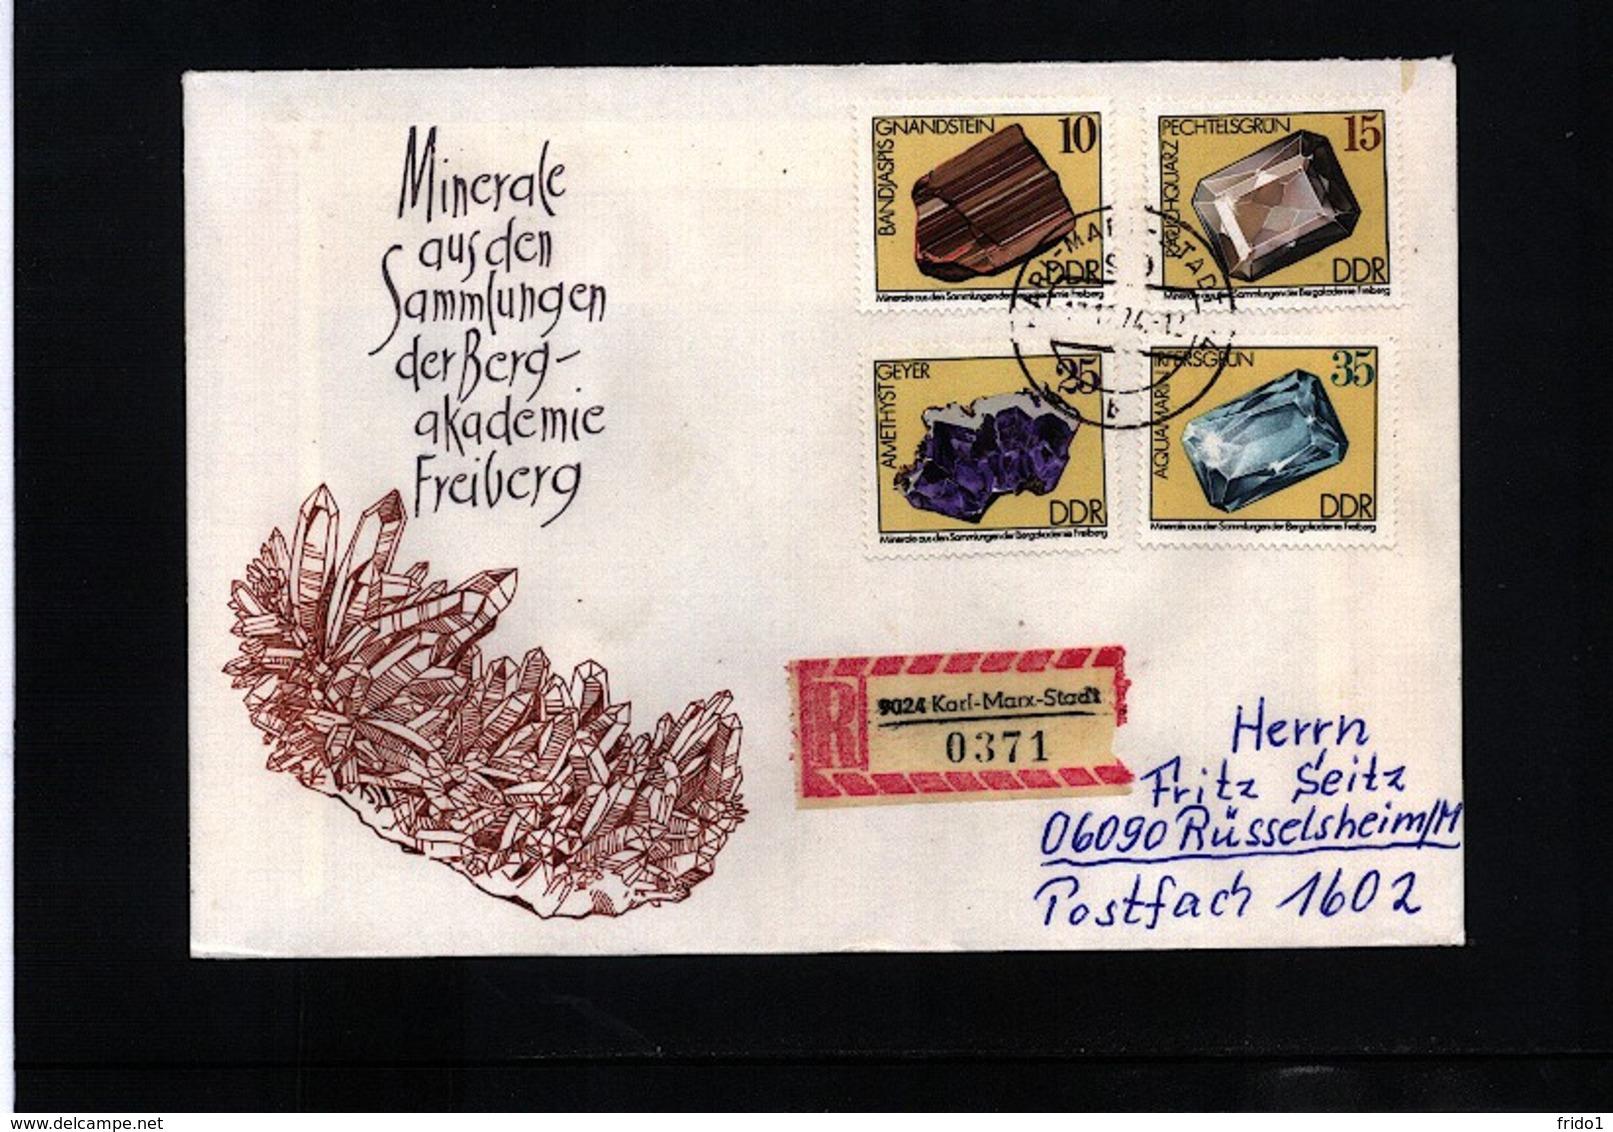 Germany DDR Minerals Interesting Registered Letter - Mineralien